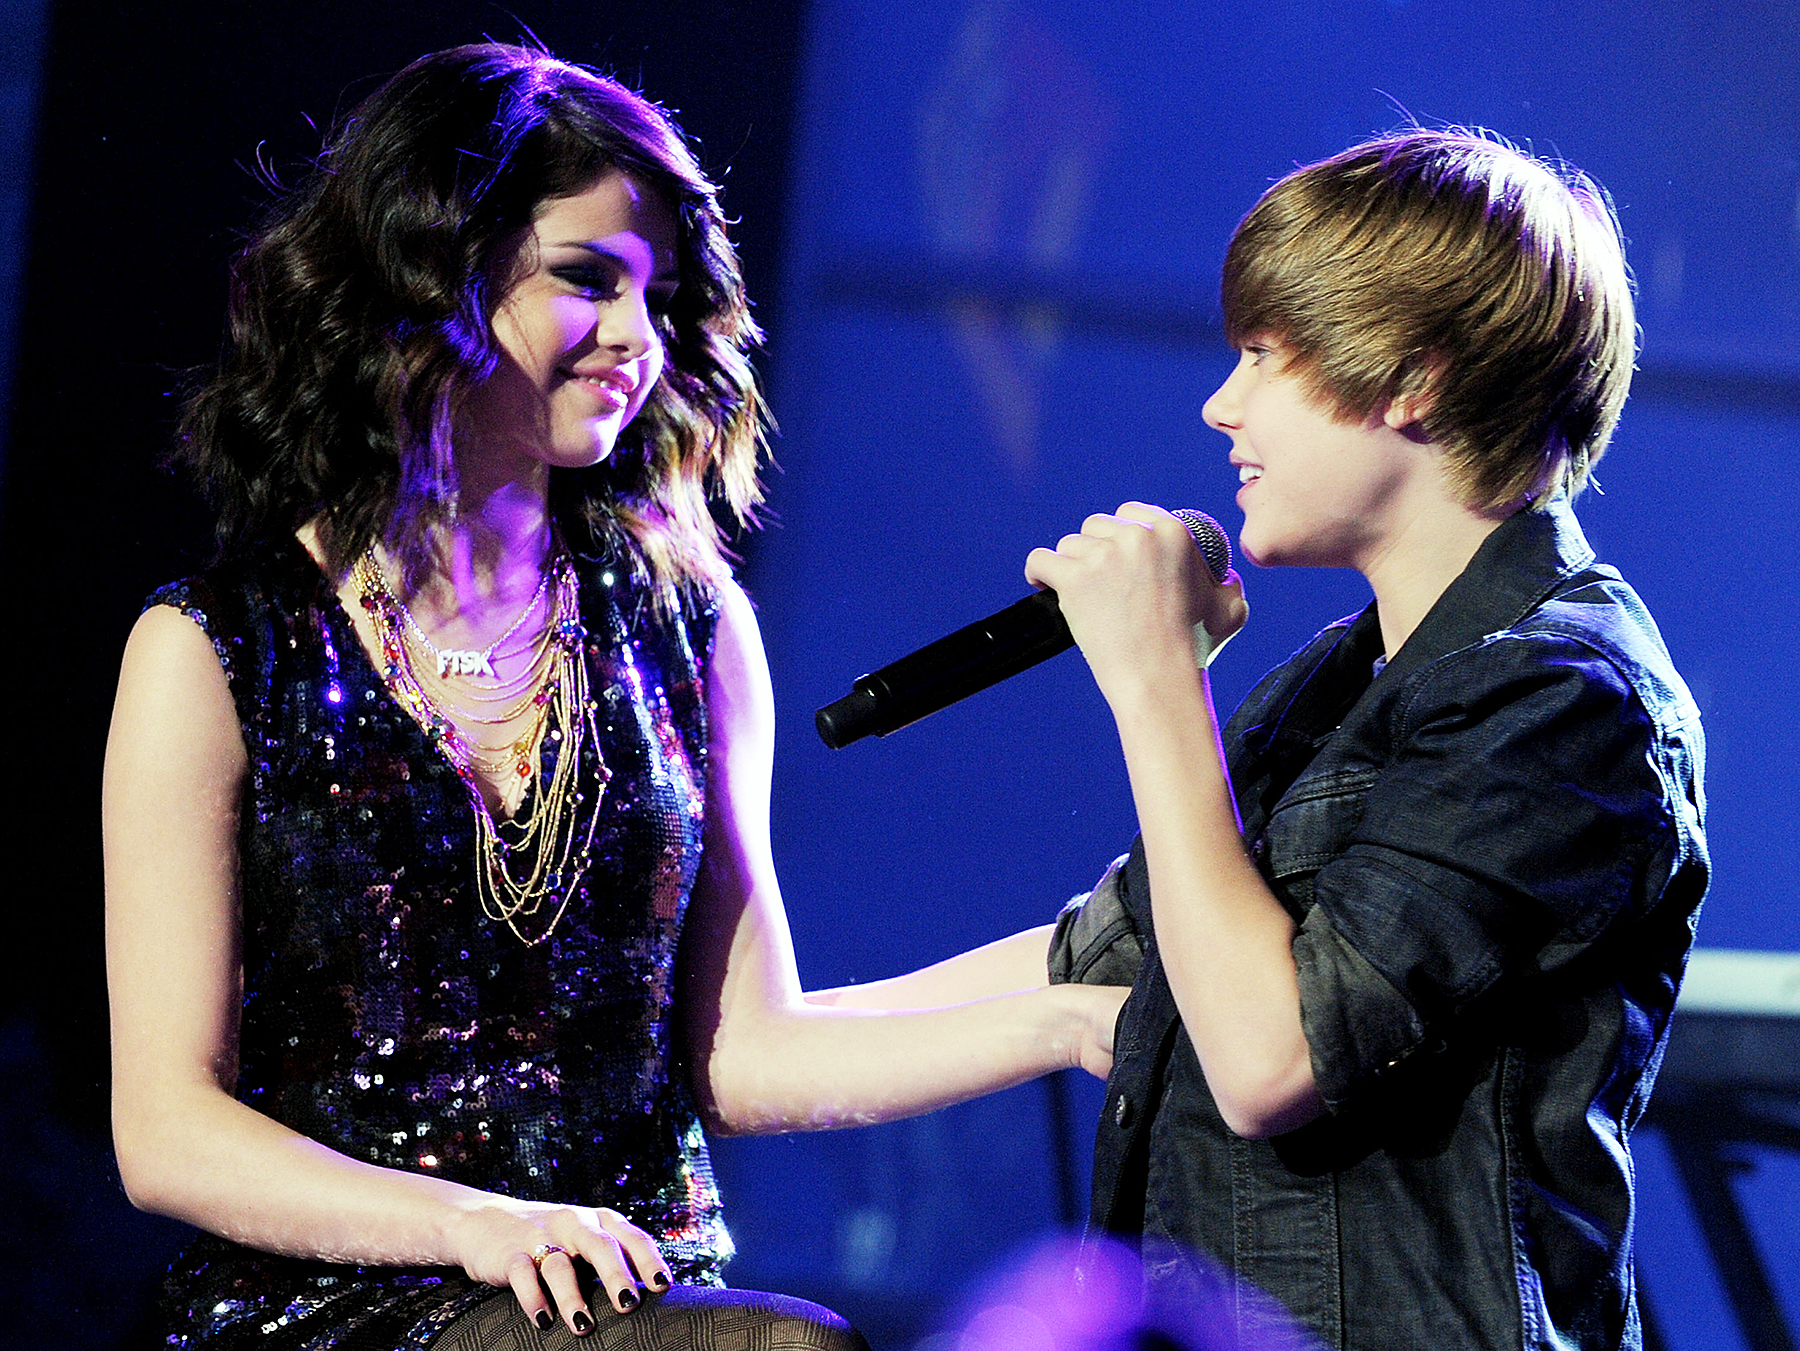 File:Justin singing OLLG to Selena Gomez.jpeg